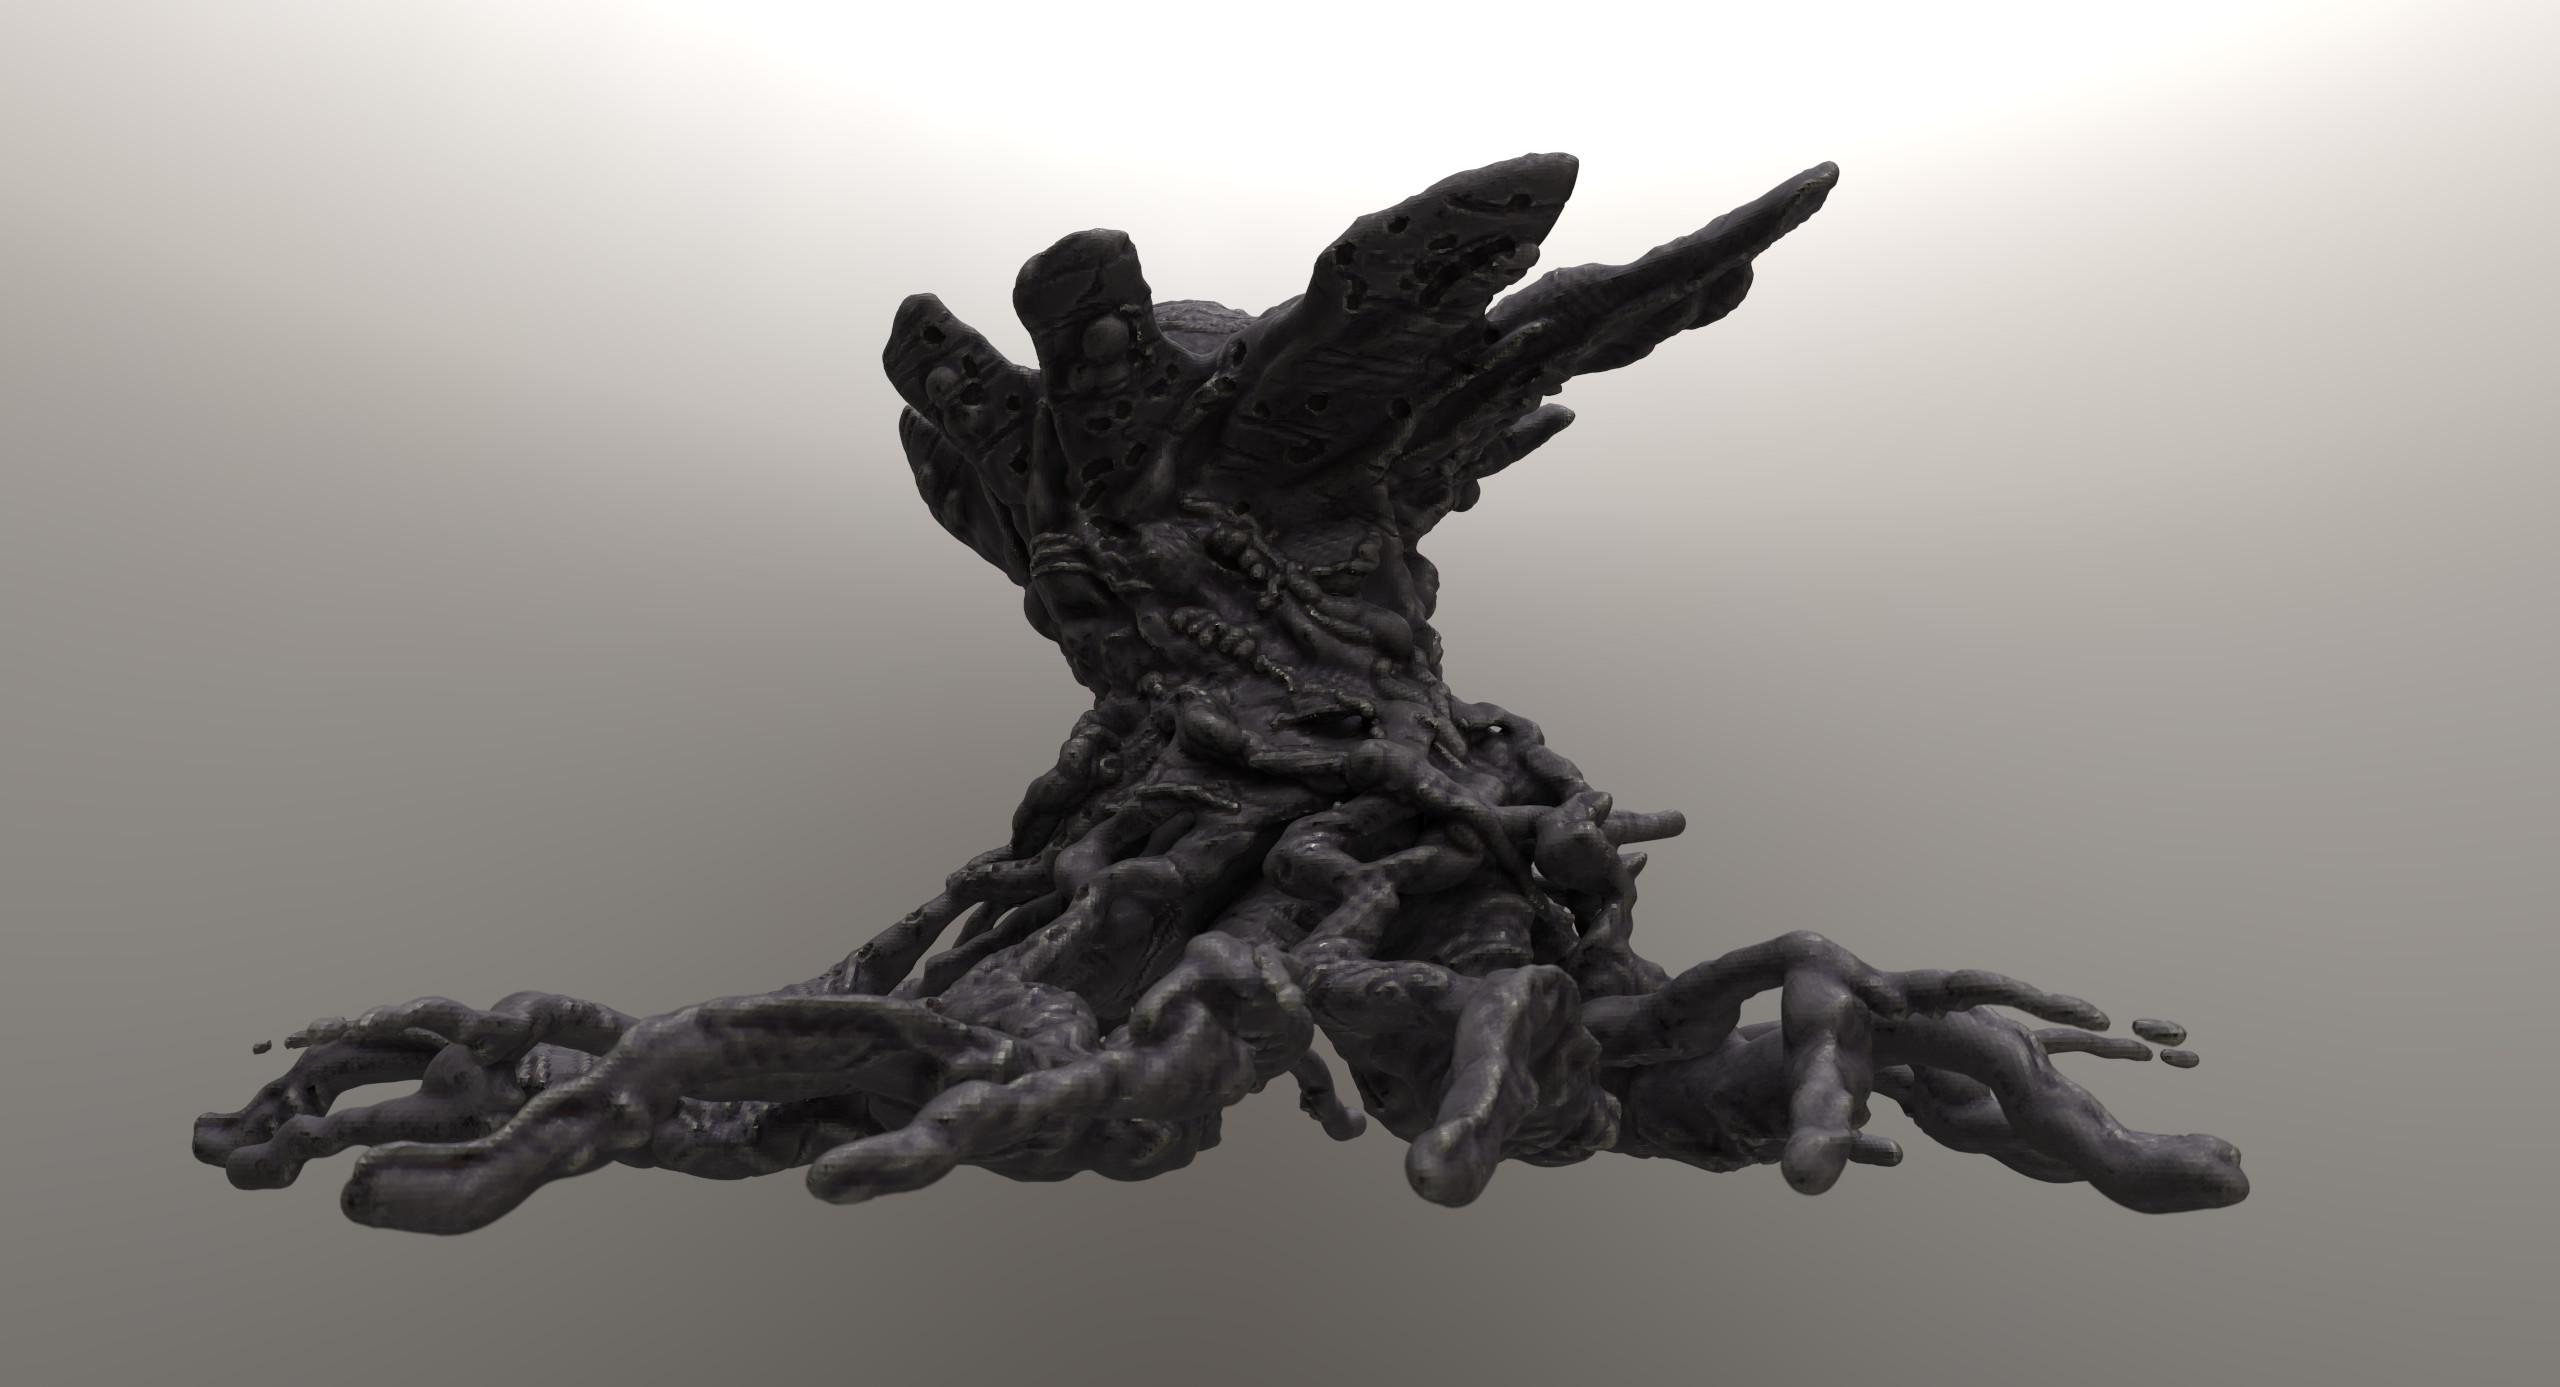 Model made in 3D coat